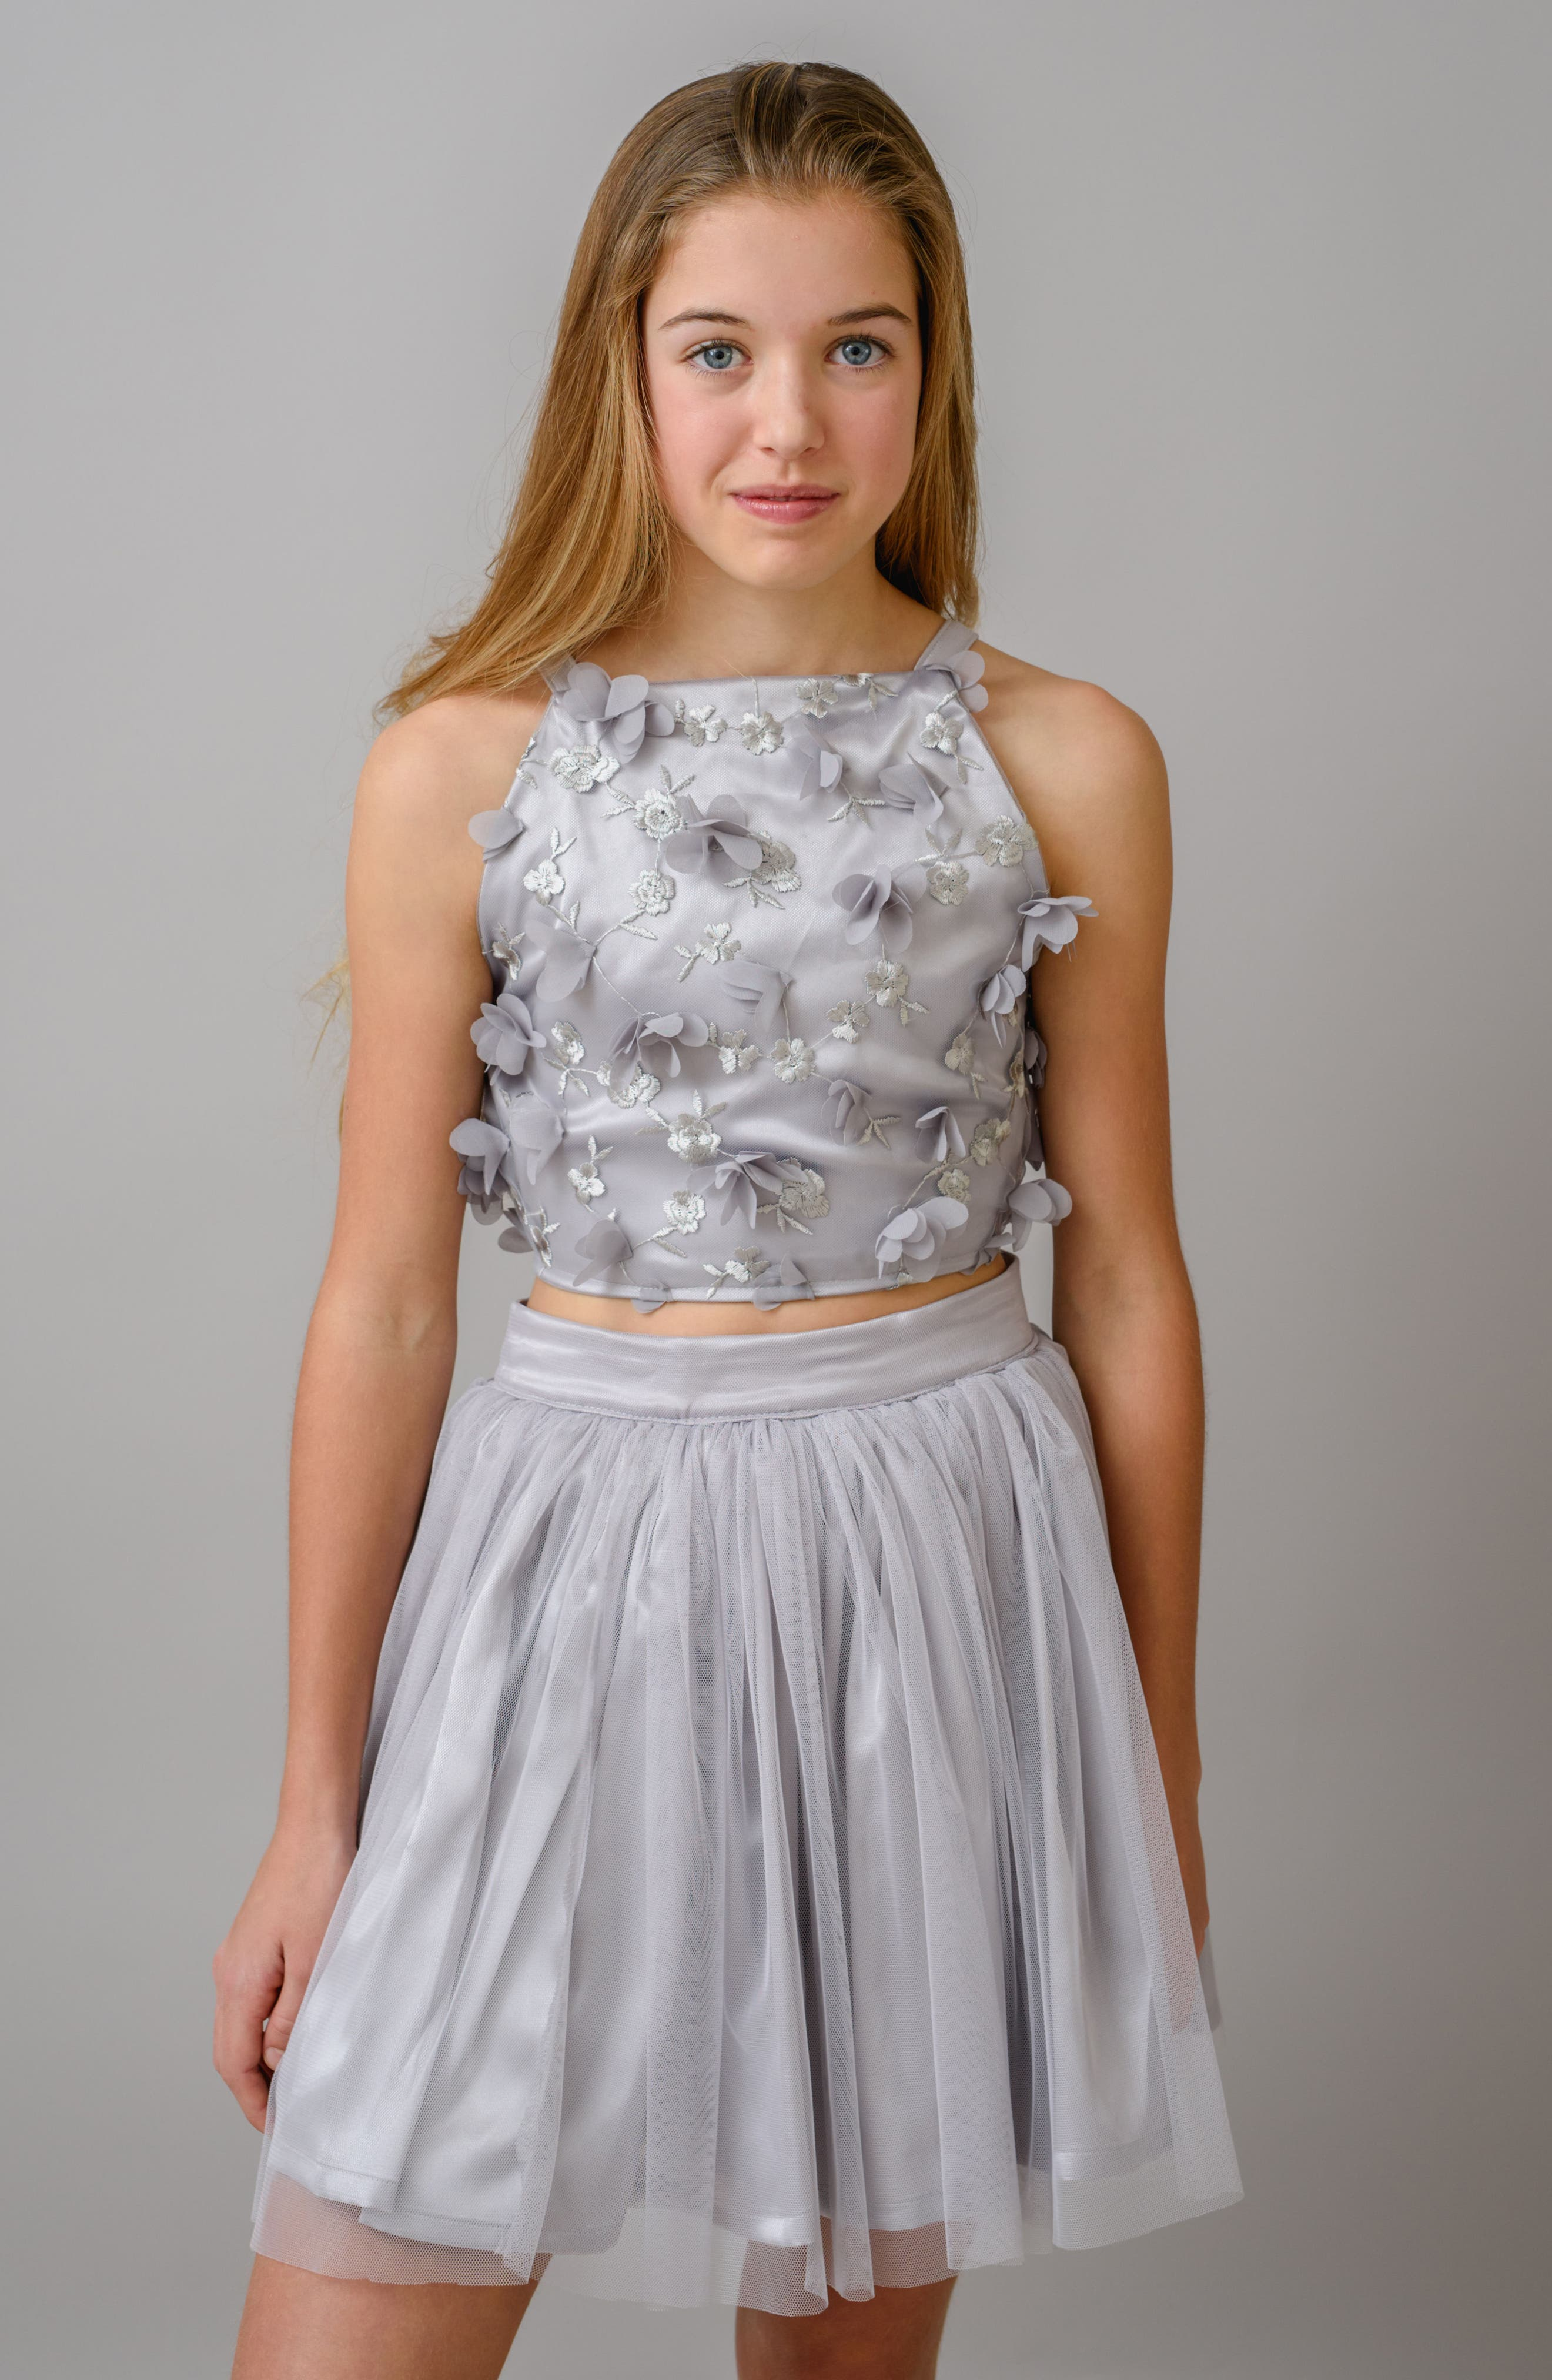 Stella M'Lia 3D Tulle Two-Piece Dress,                             Alternate thumbnail 5, color,